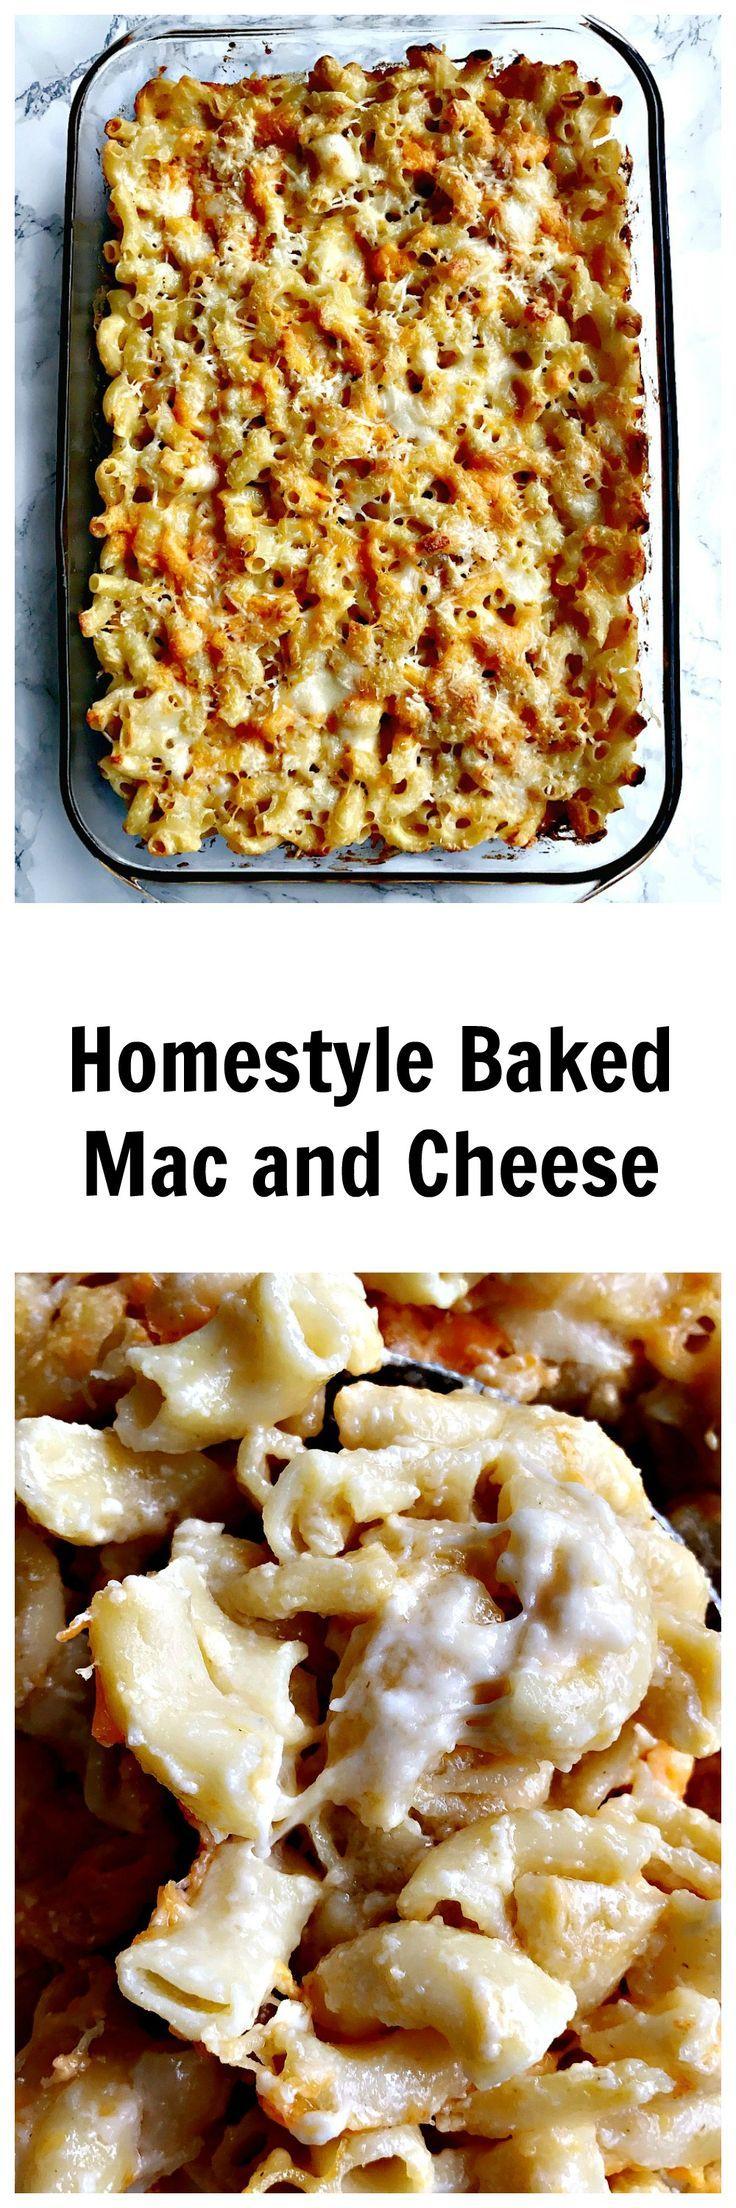 Baked Macaroni on Pinterest | Macaroni and cheese, Macaroni and Cheese ...